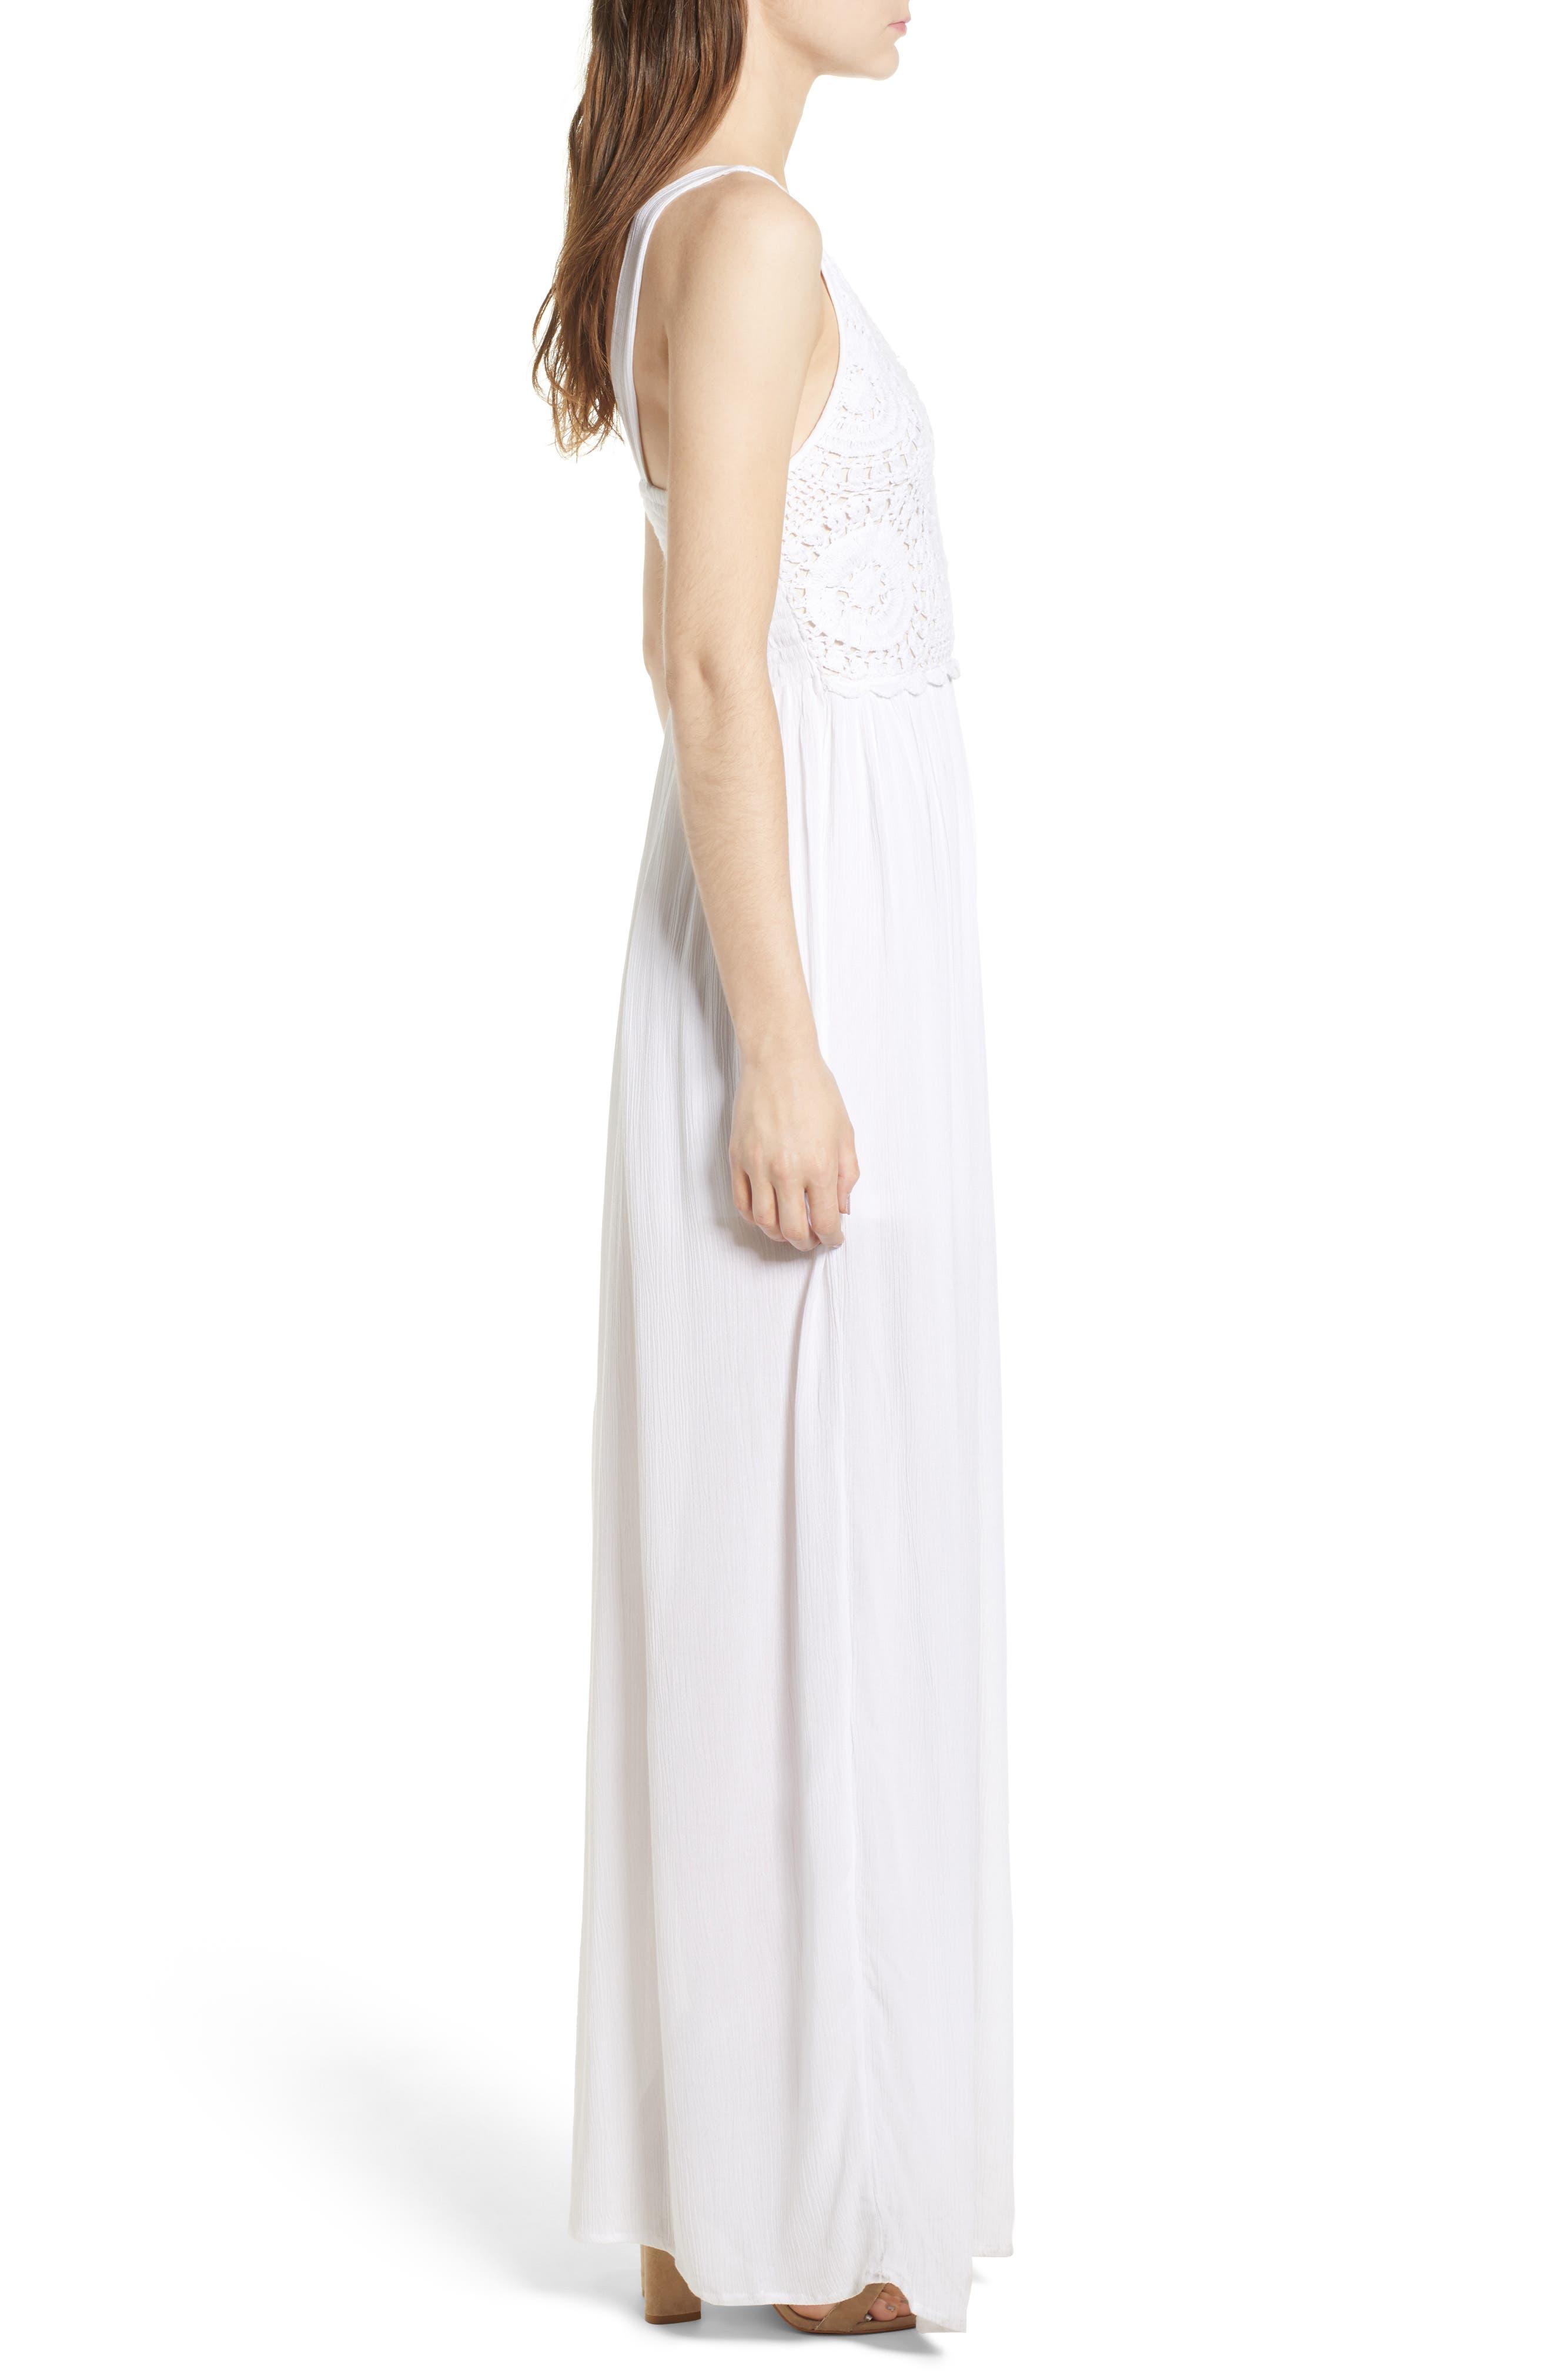 Bishop + Young Bora Bora Maxi Dress,                             Alternate thumbnail 3, color,                             White